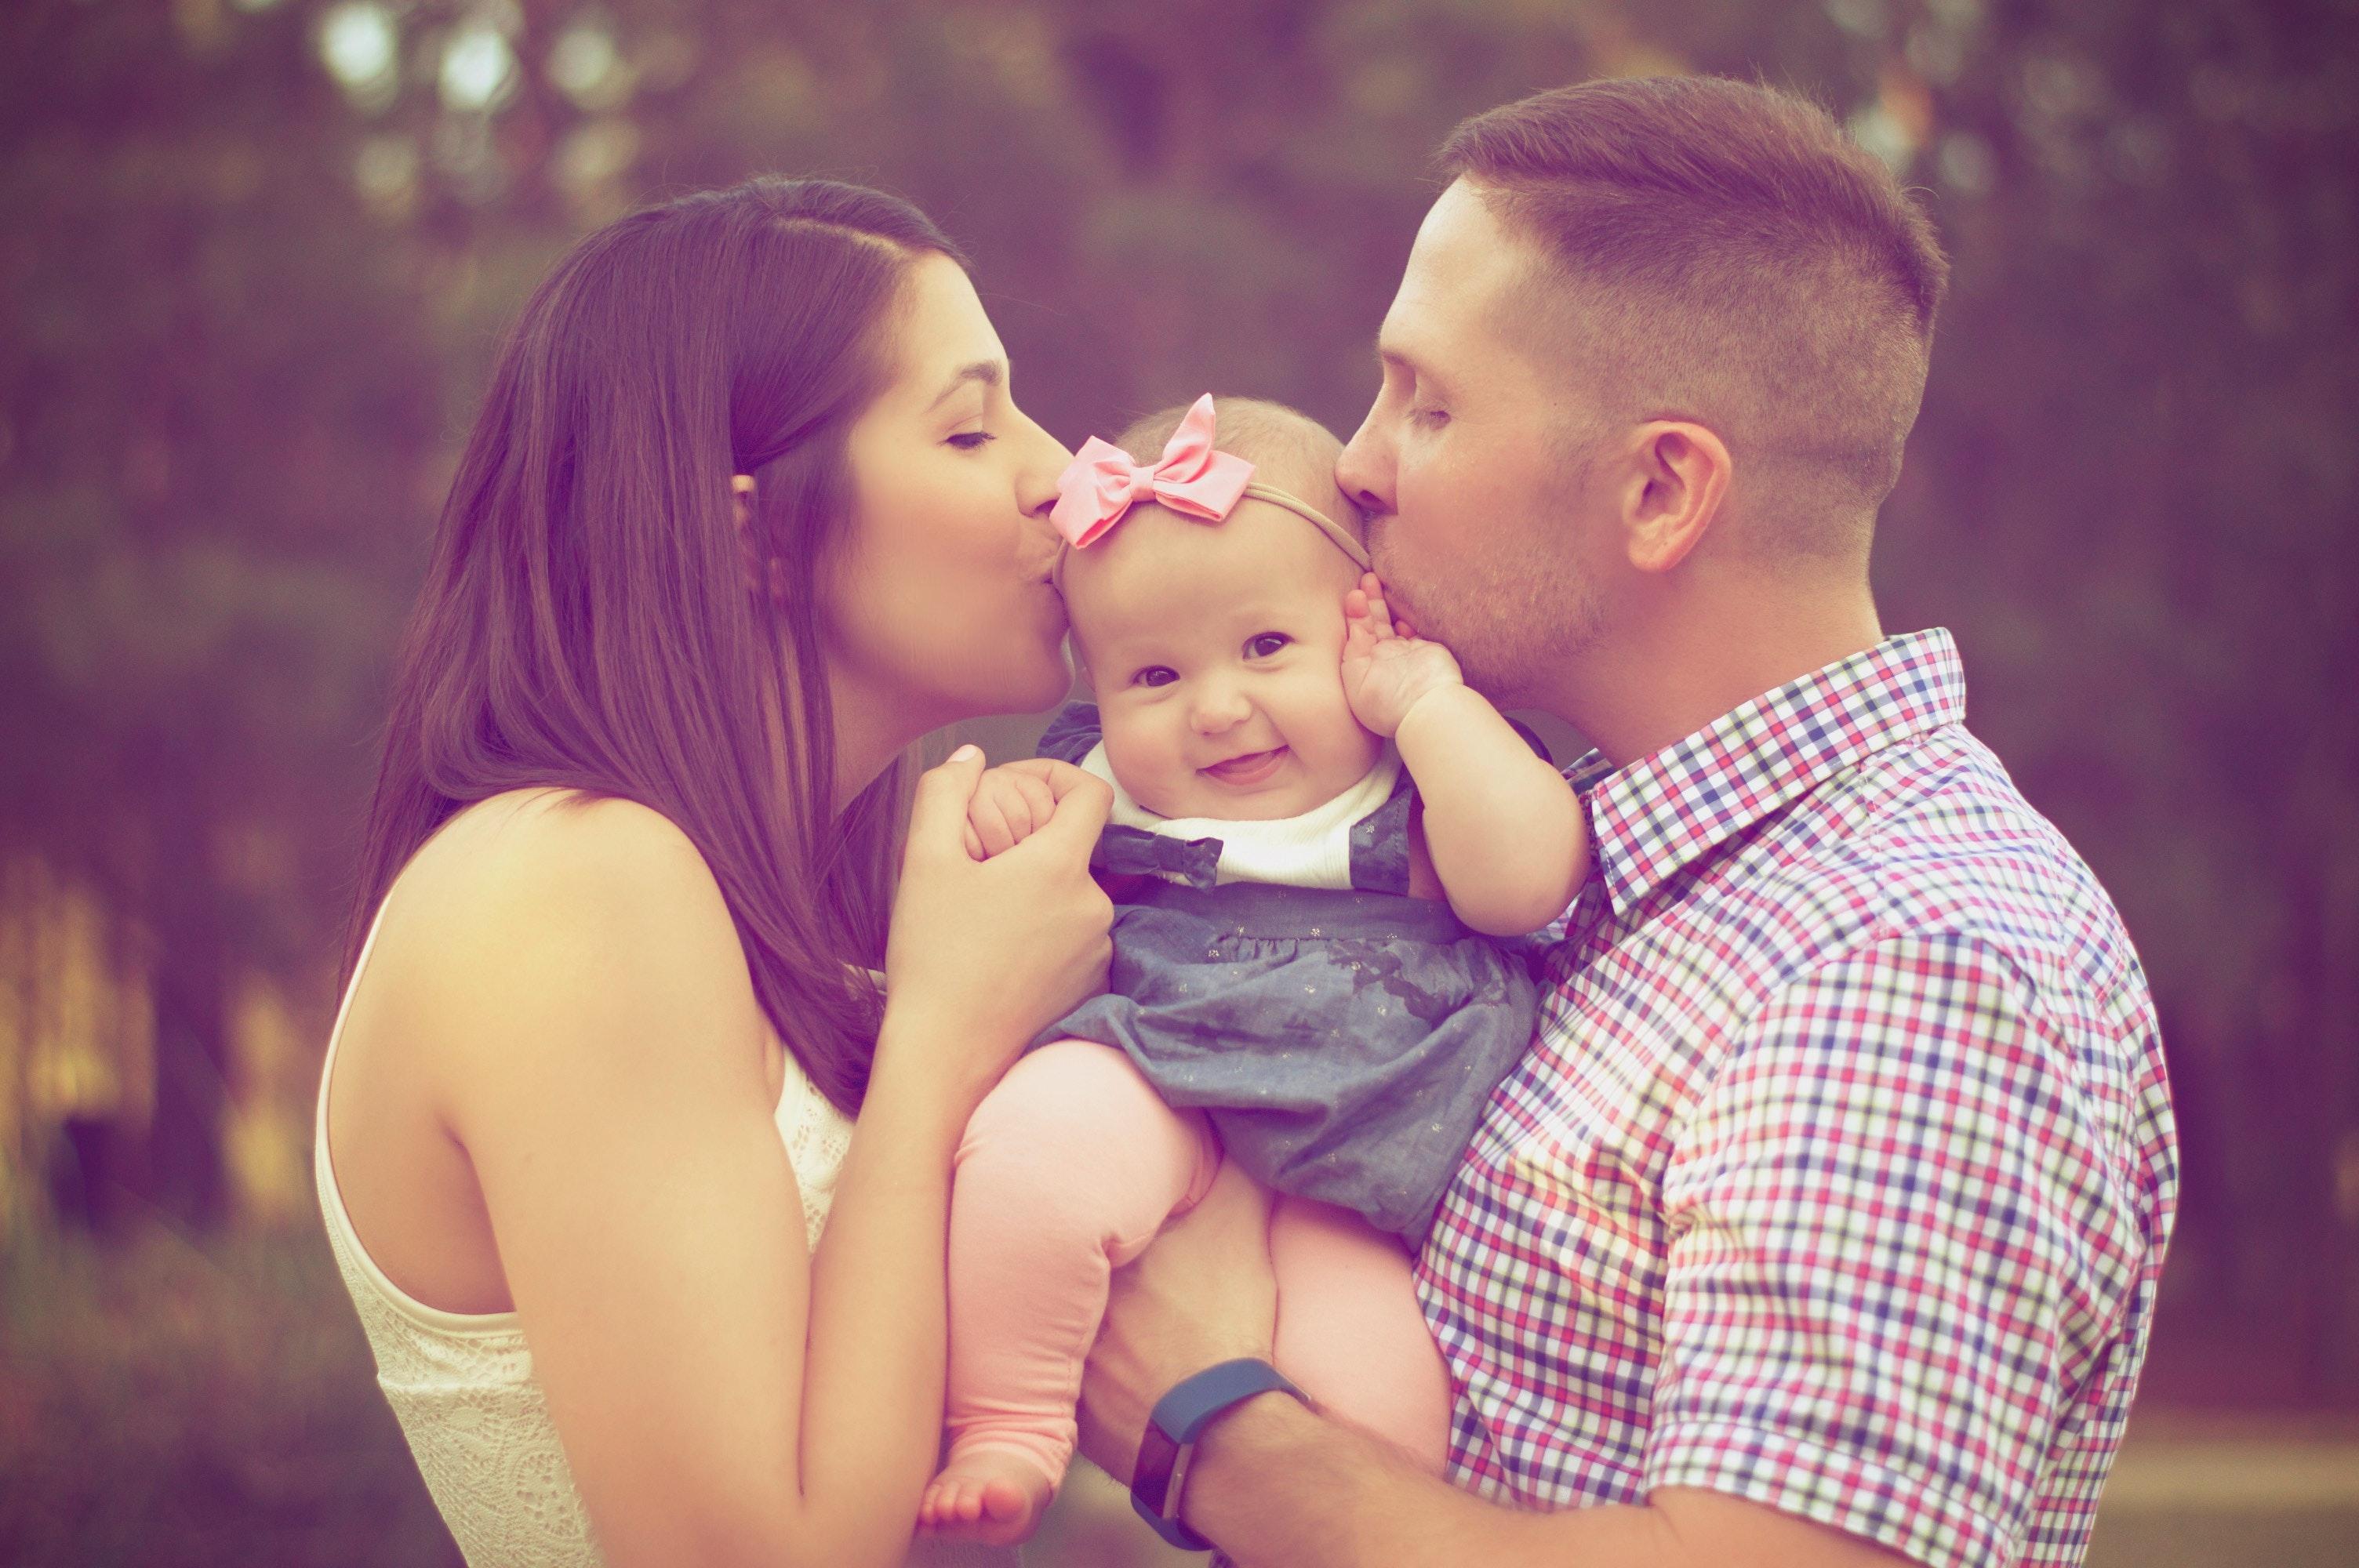 1000+ amazing baby girl photos · pexels · free stock photos